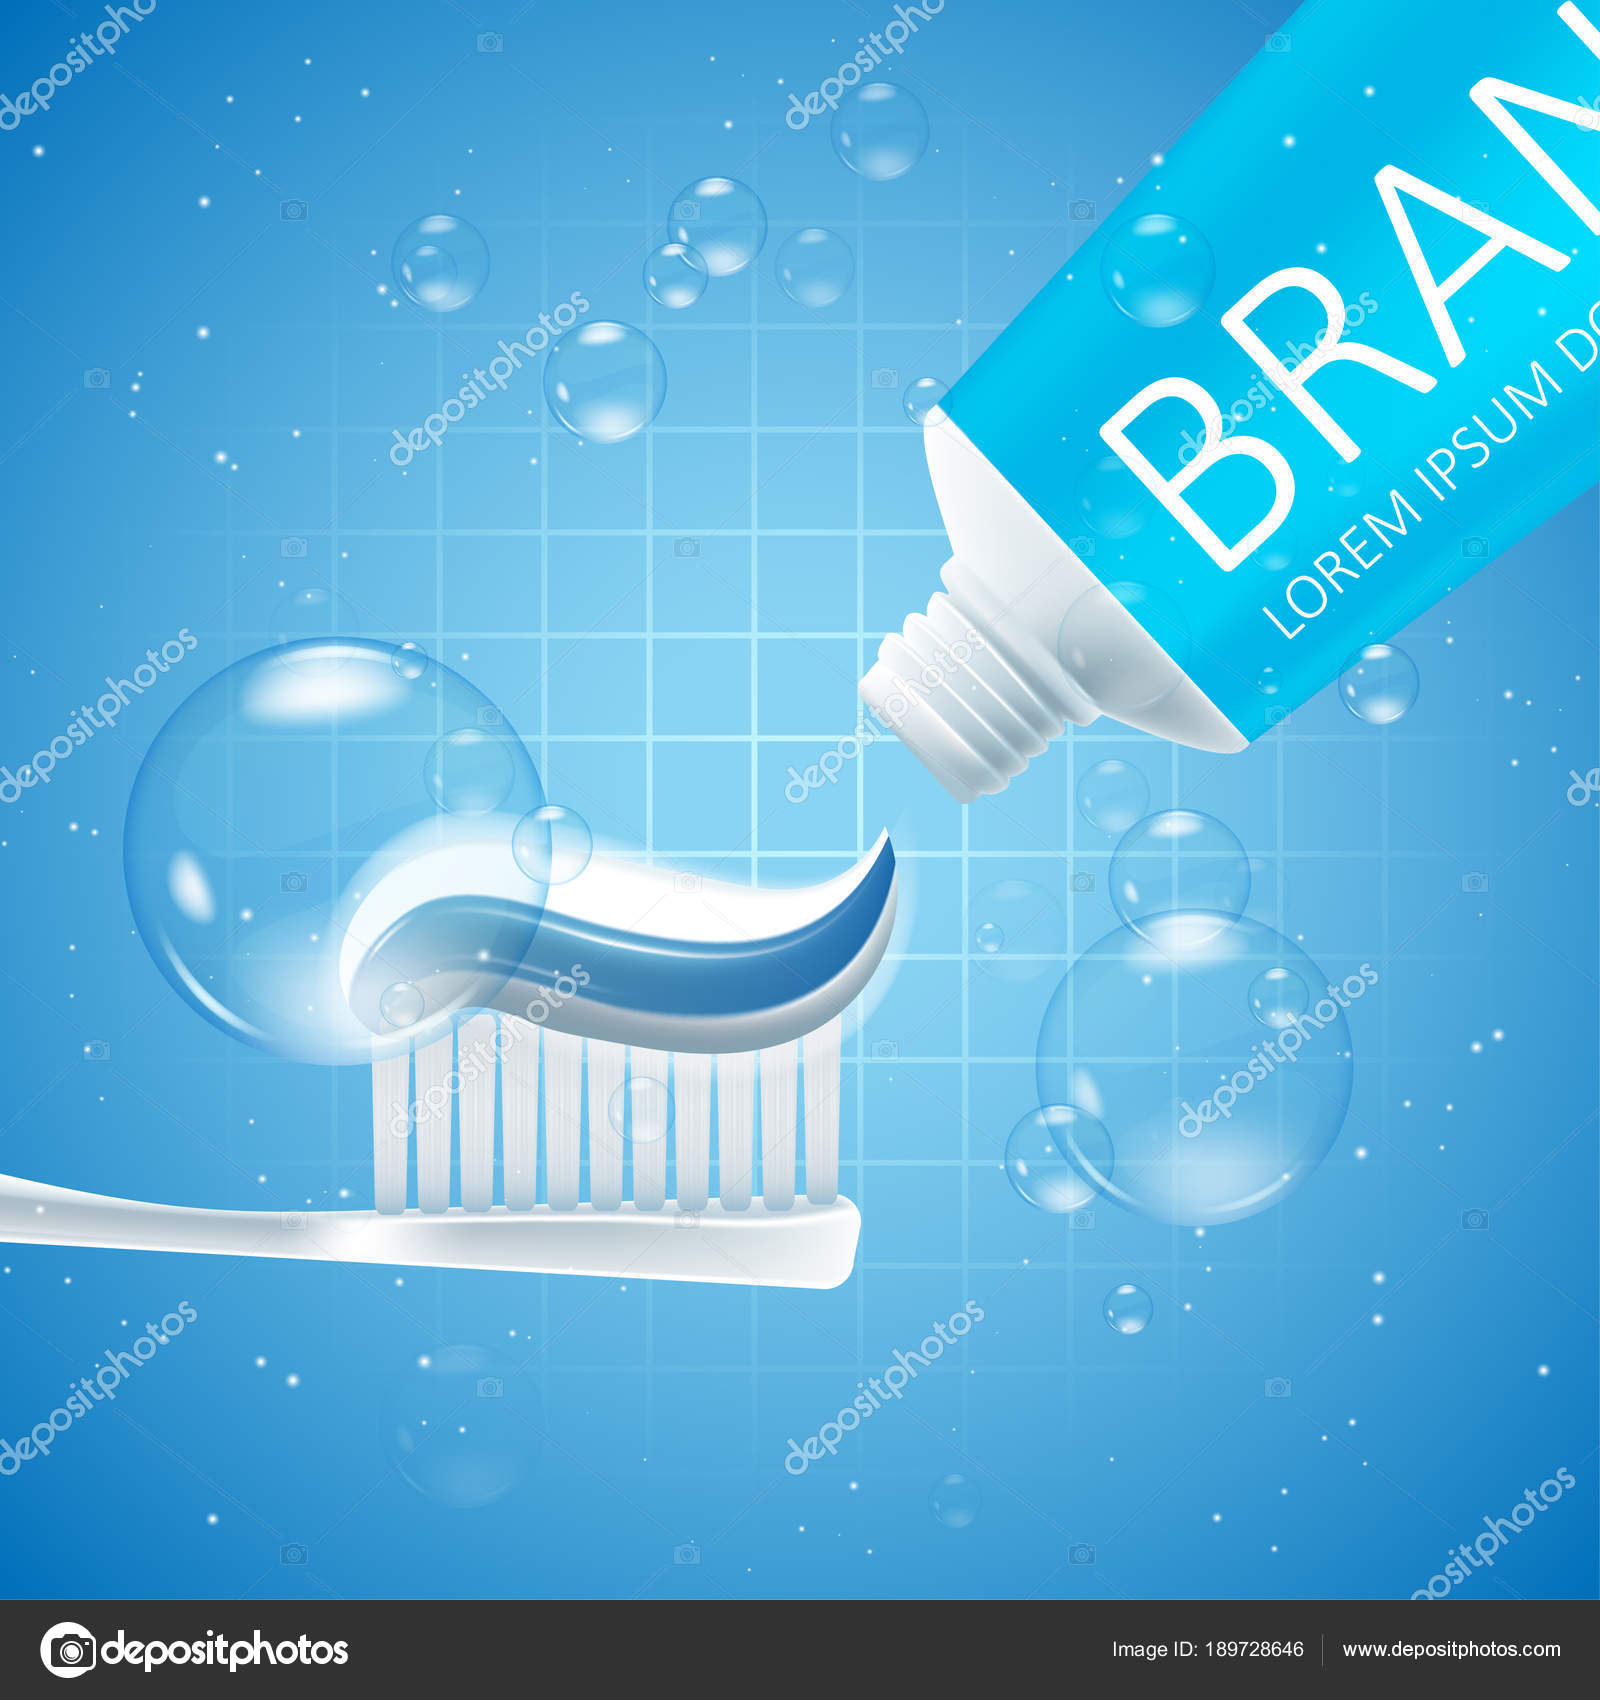 Anuncios De Creme Dental Clareador Vetor De Stock C Majcot 189728646